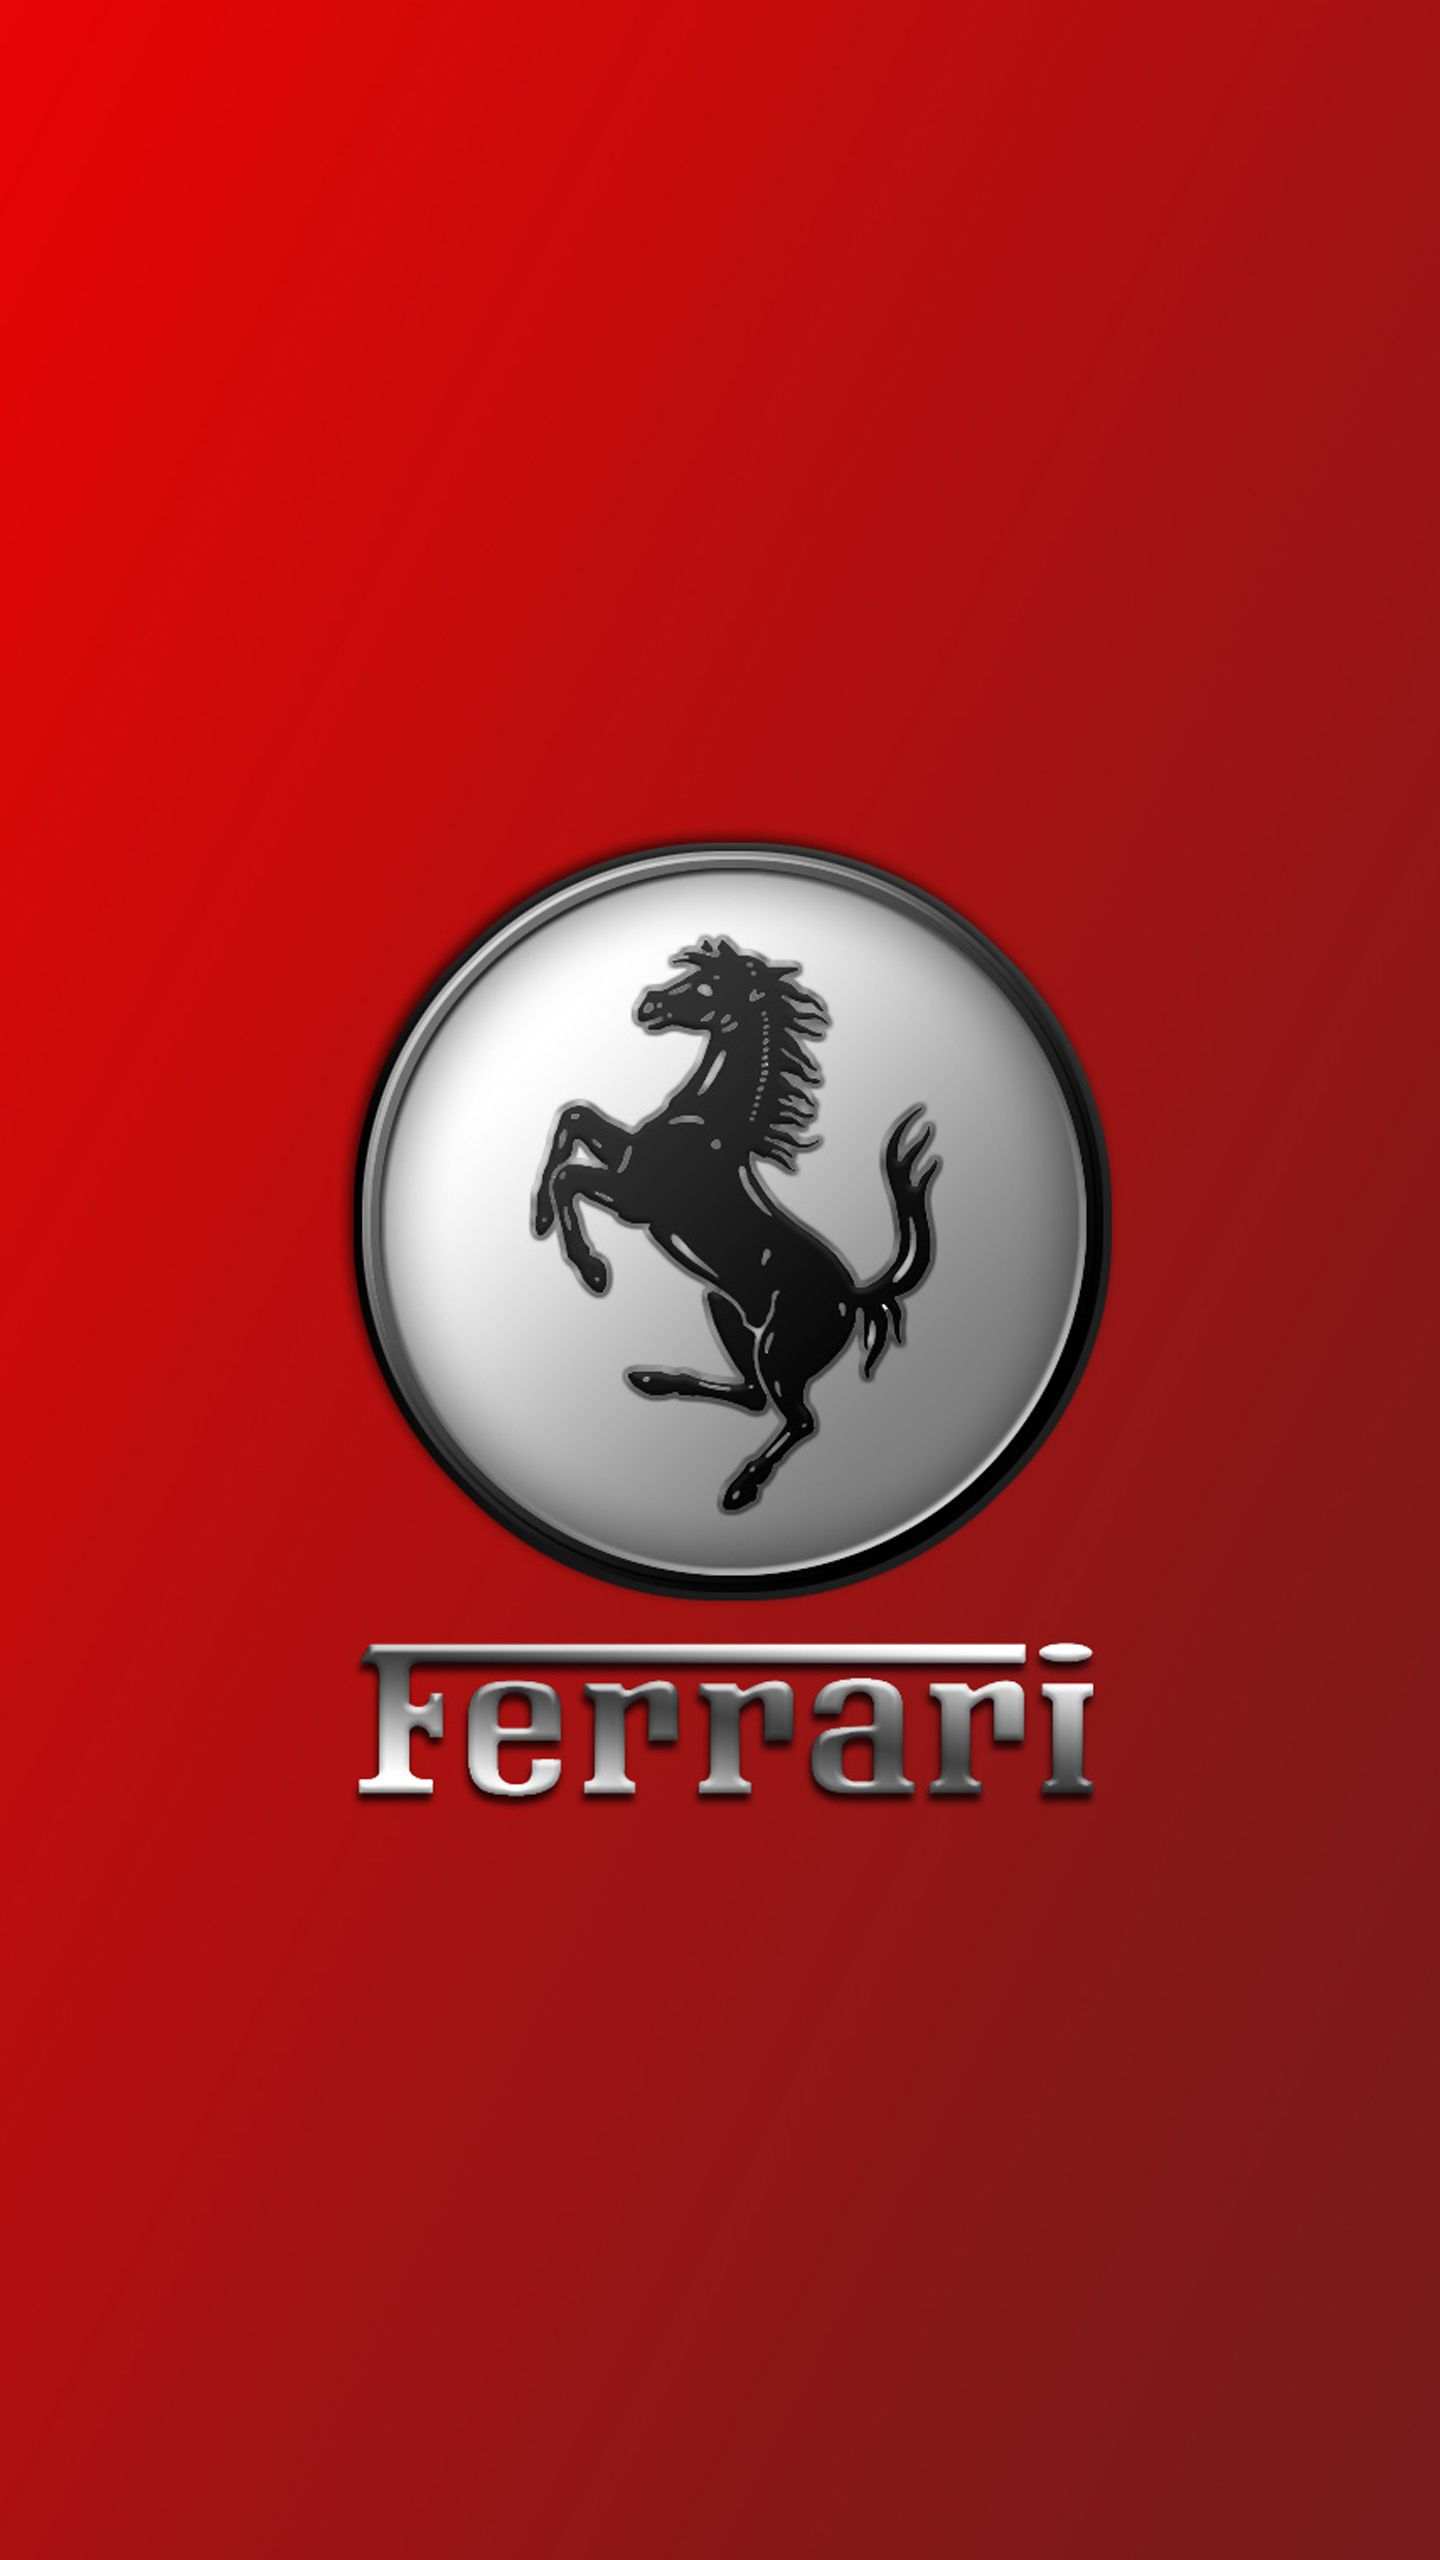 Pin By Lynda Jennings On Home Screen And Wallpaper Ferrari Car